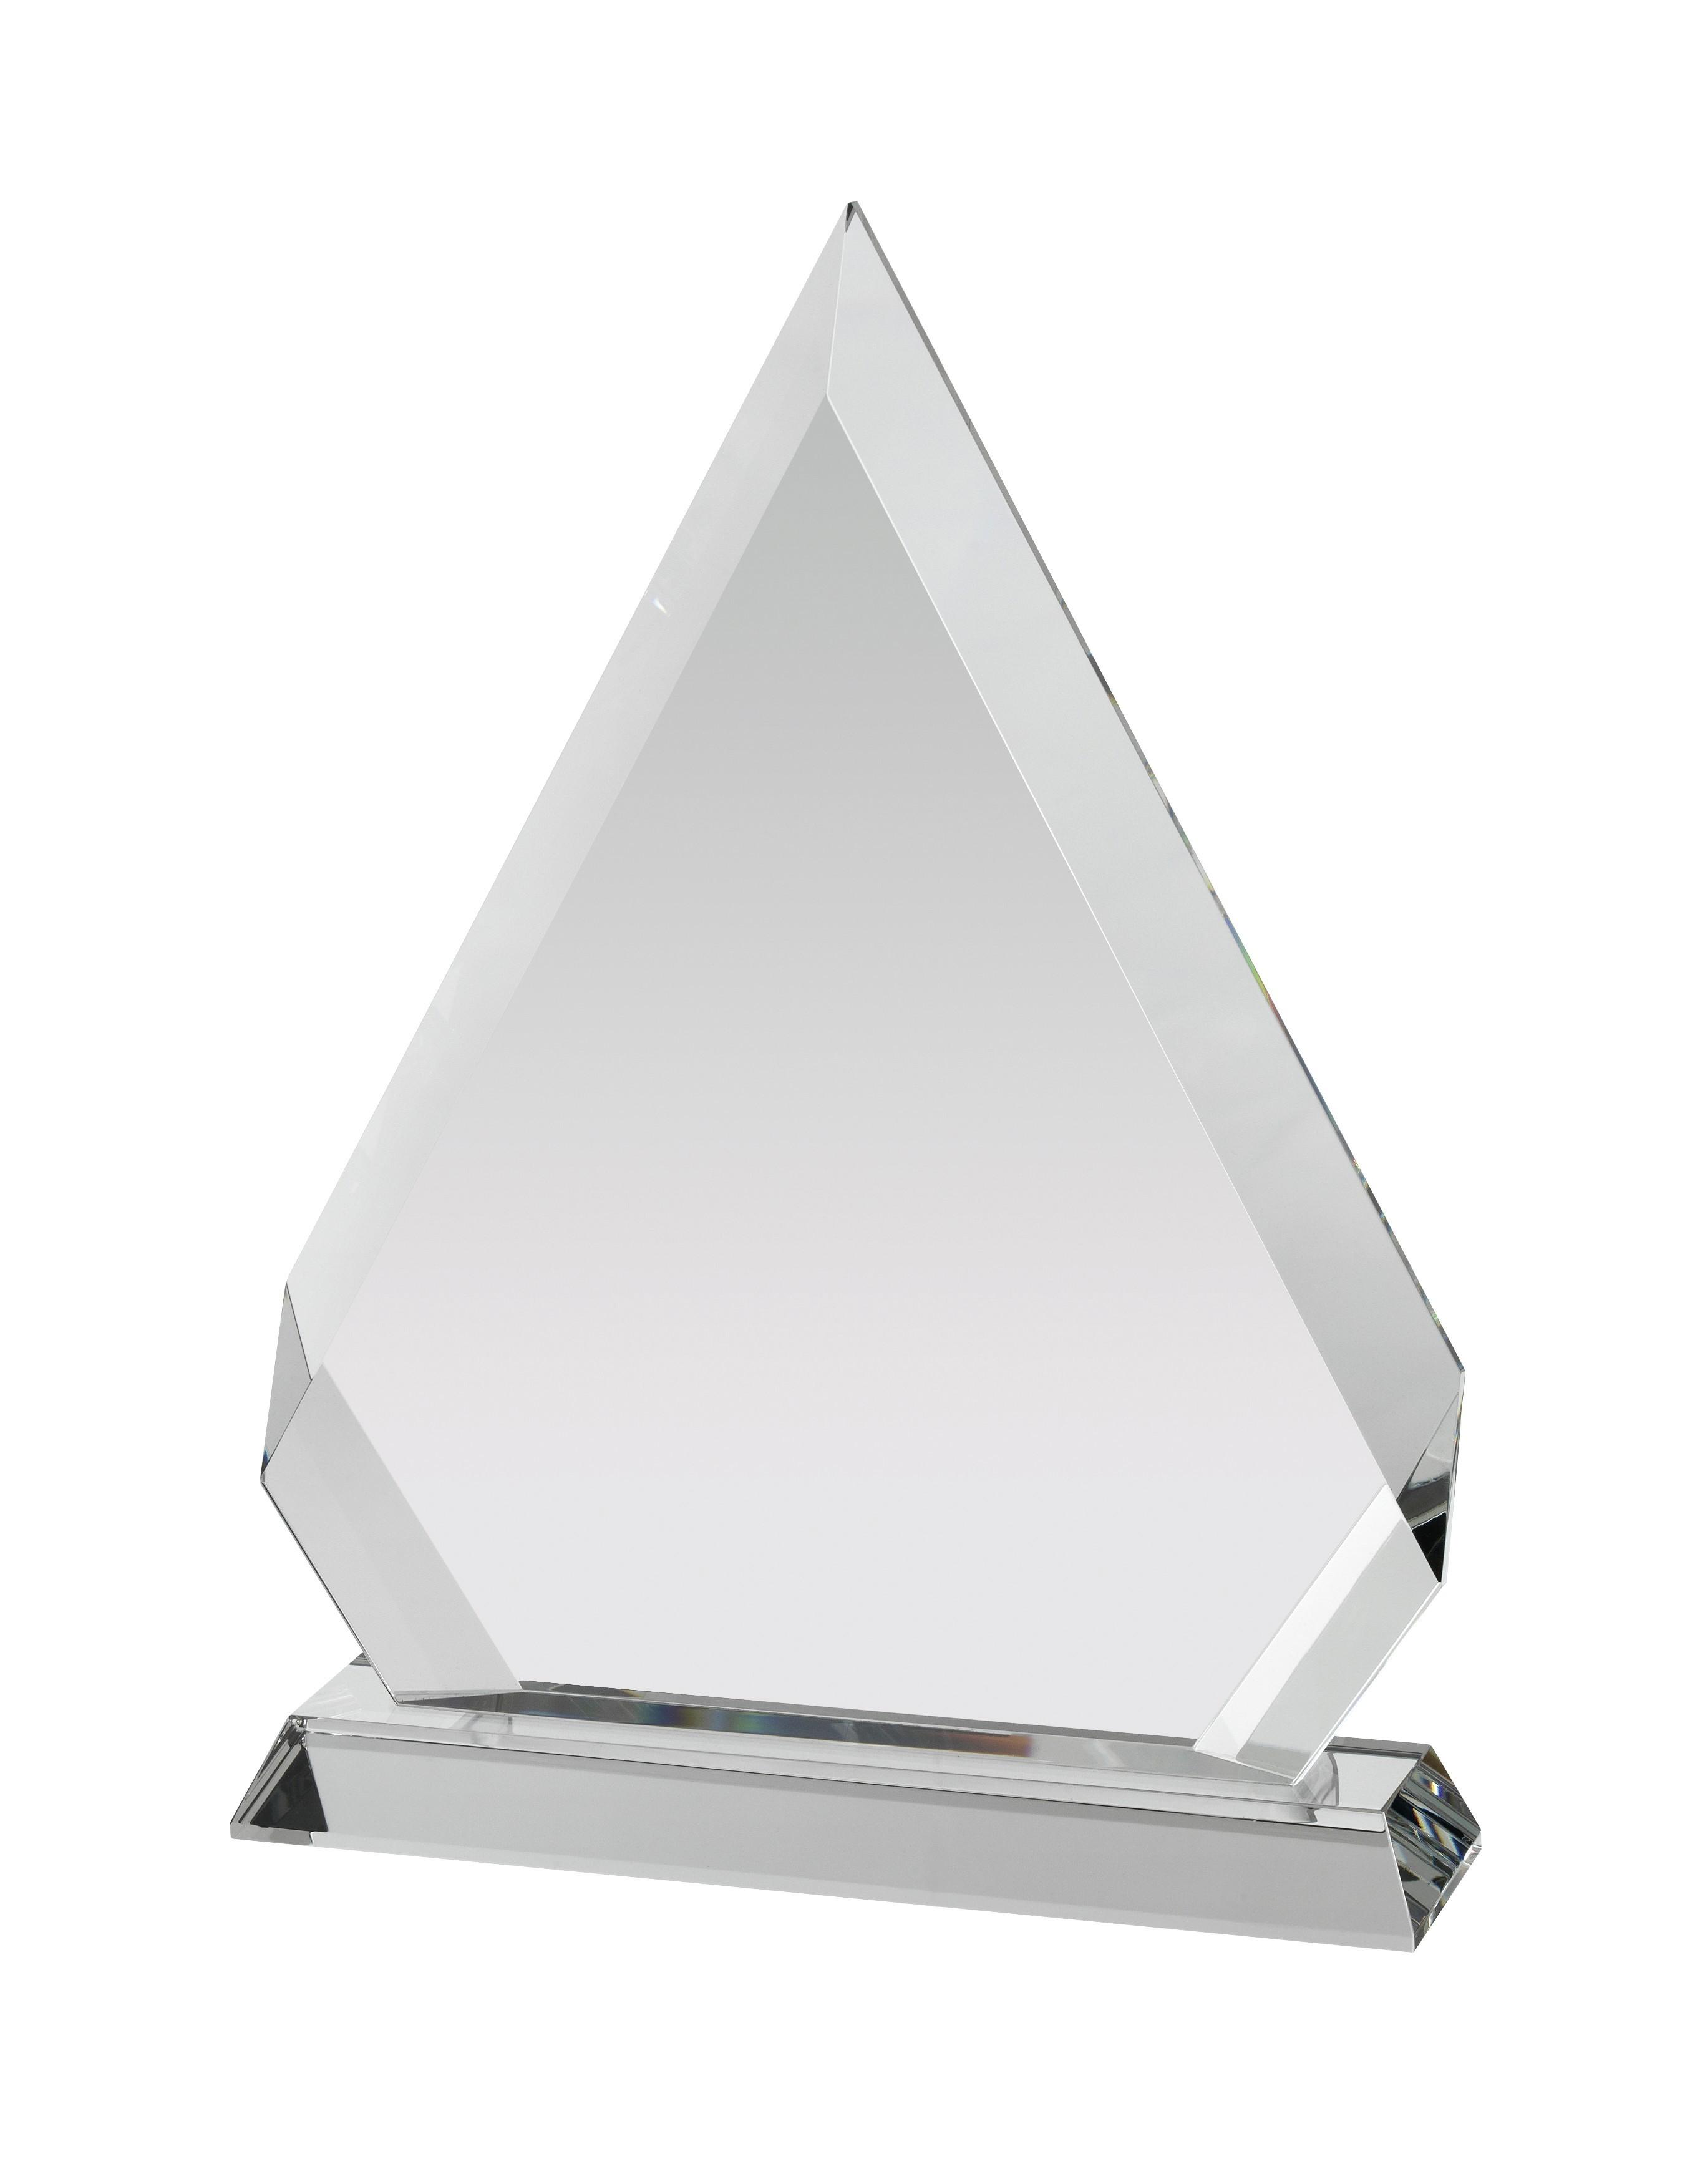 Small Luxor Award